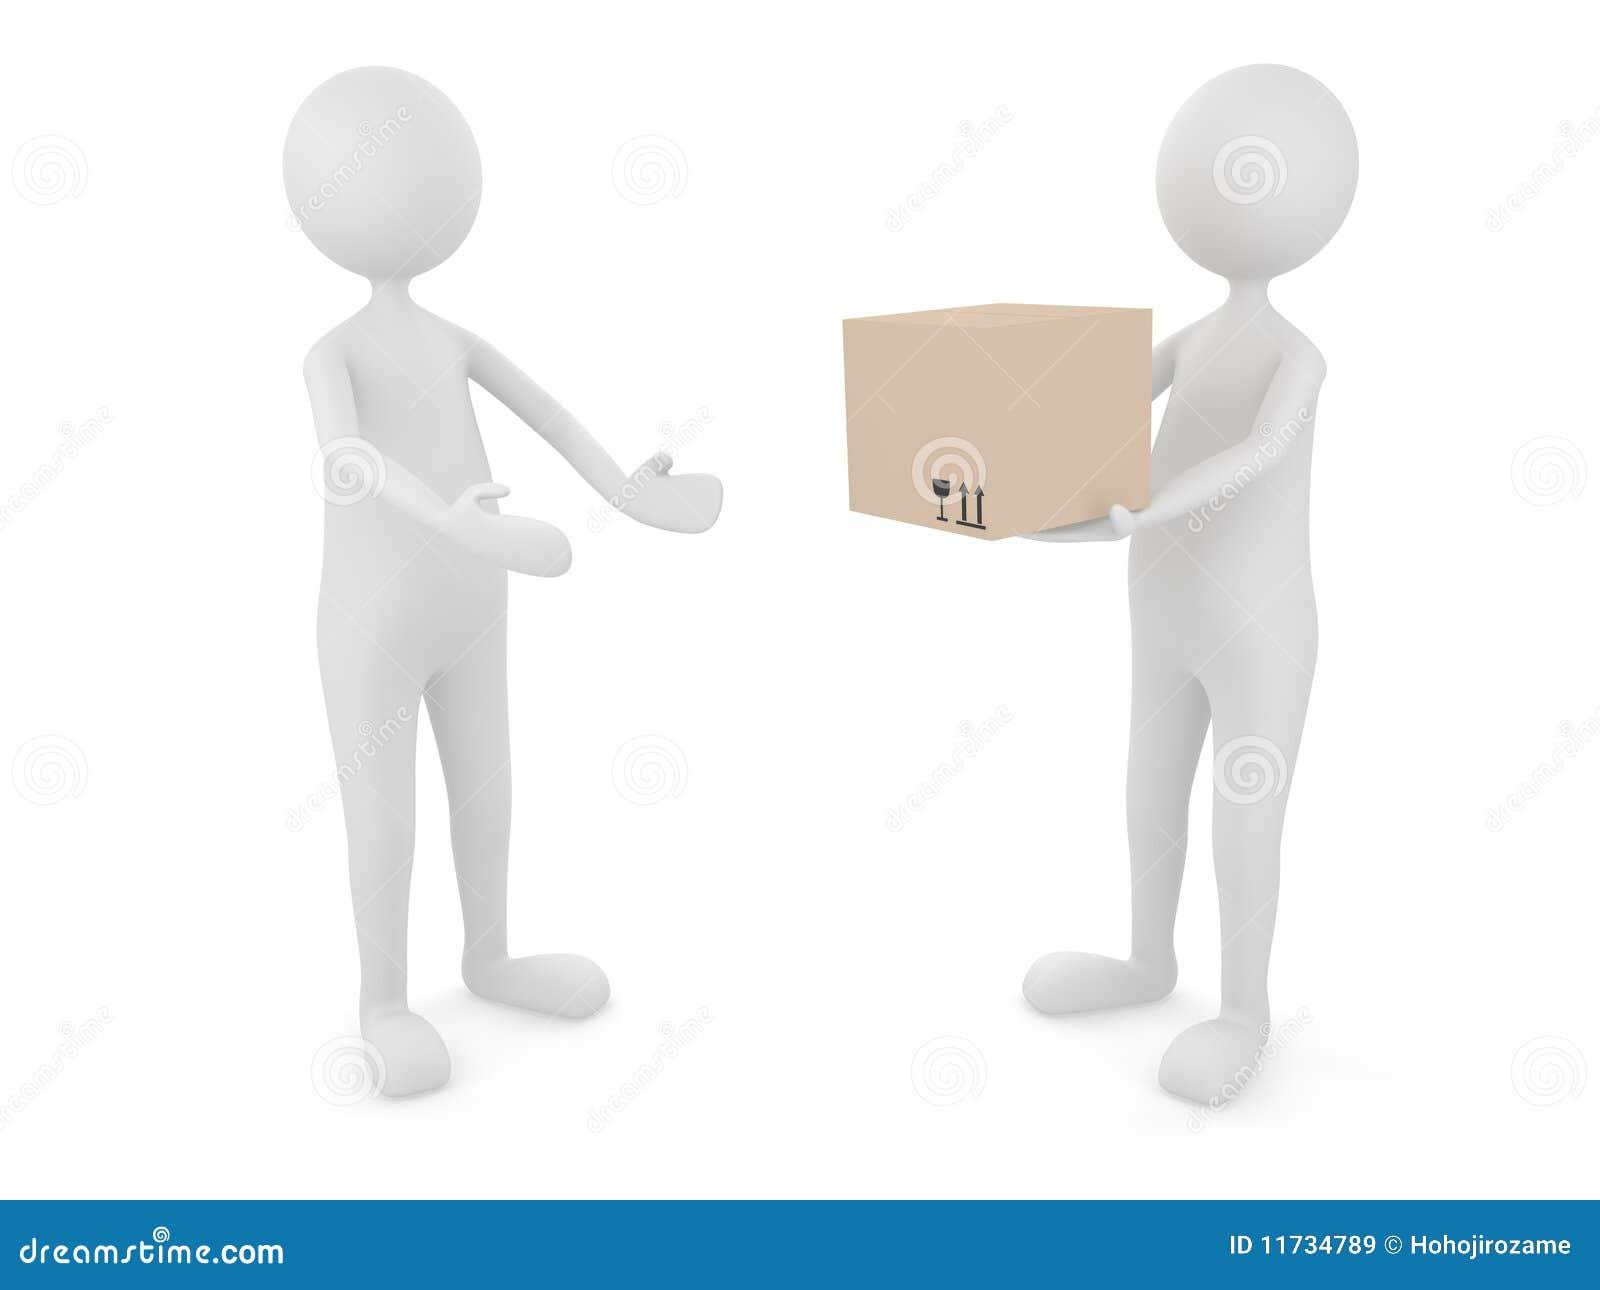 Mann, der Sammelpack an einen Klienten liefert